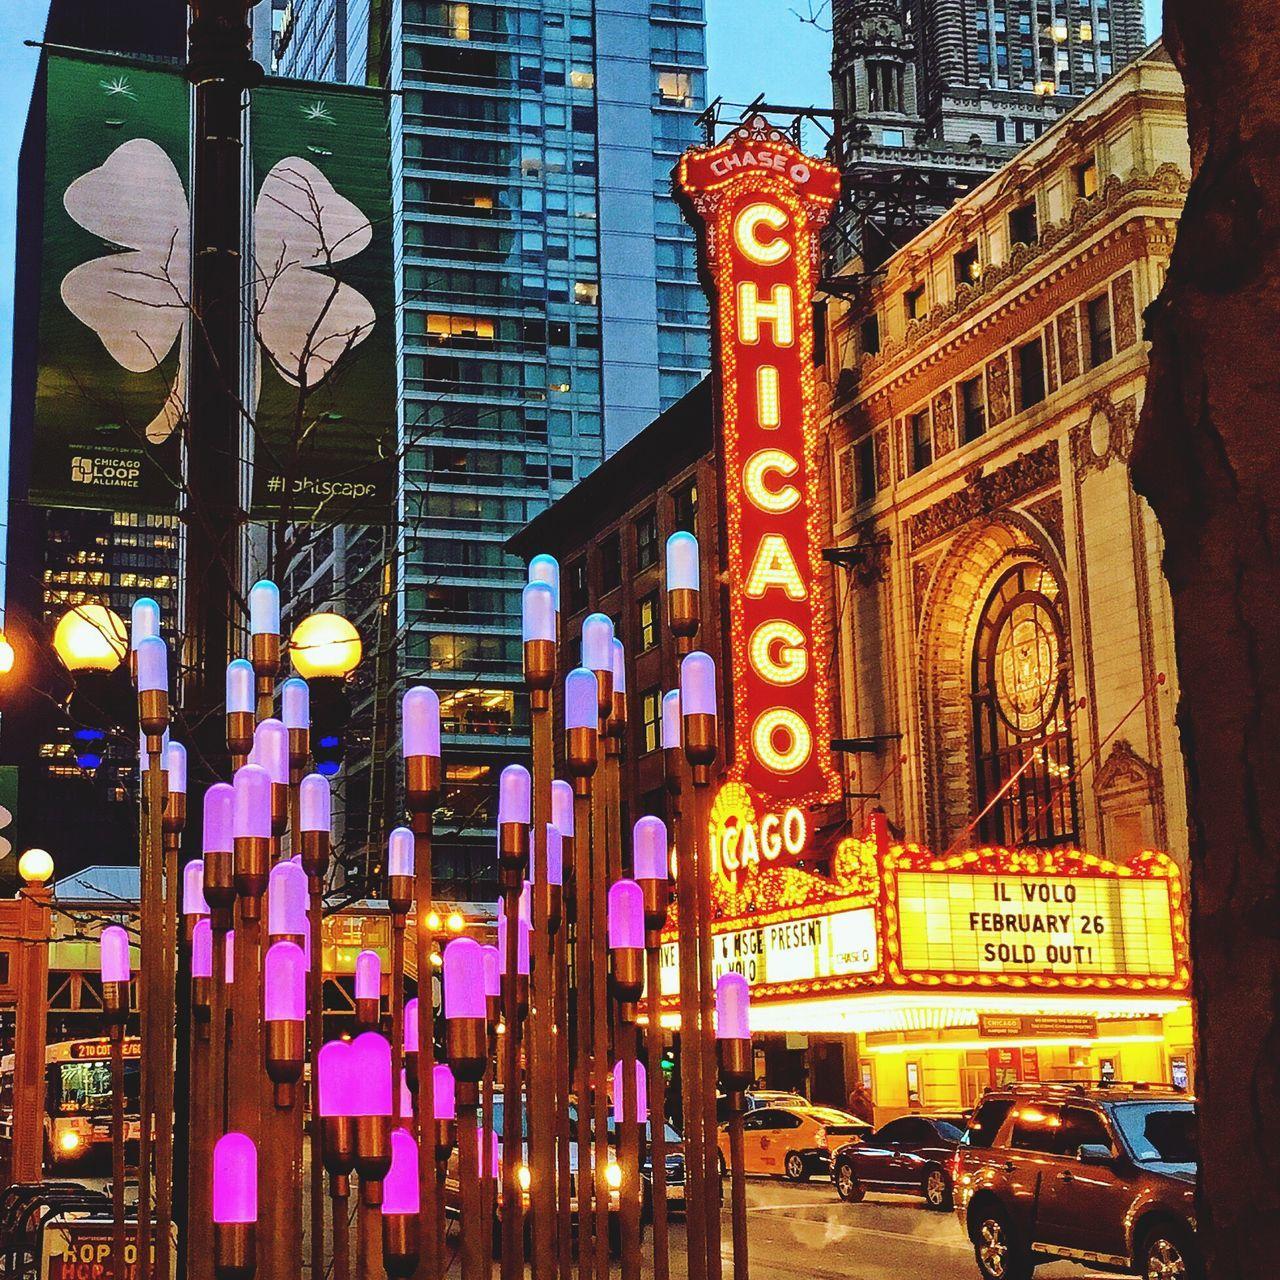 Chicago Chicagoloop Windy City Chicago Street Scene Chicago Loop EyeEm Best Shots EyeEm Gallery Magnificent Mile Love Chicago Night Lights Theatre Theatre Arts Best City Ever